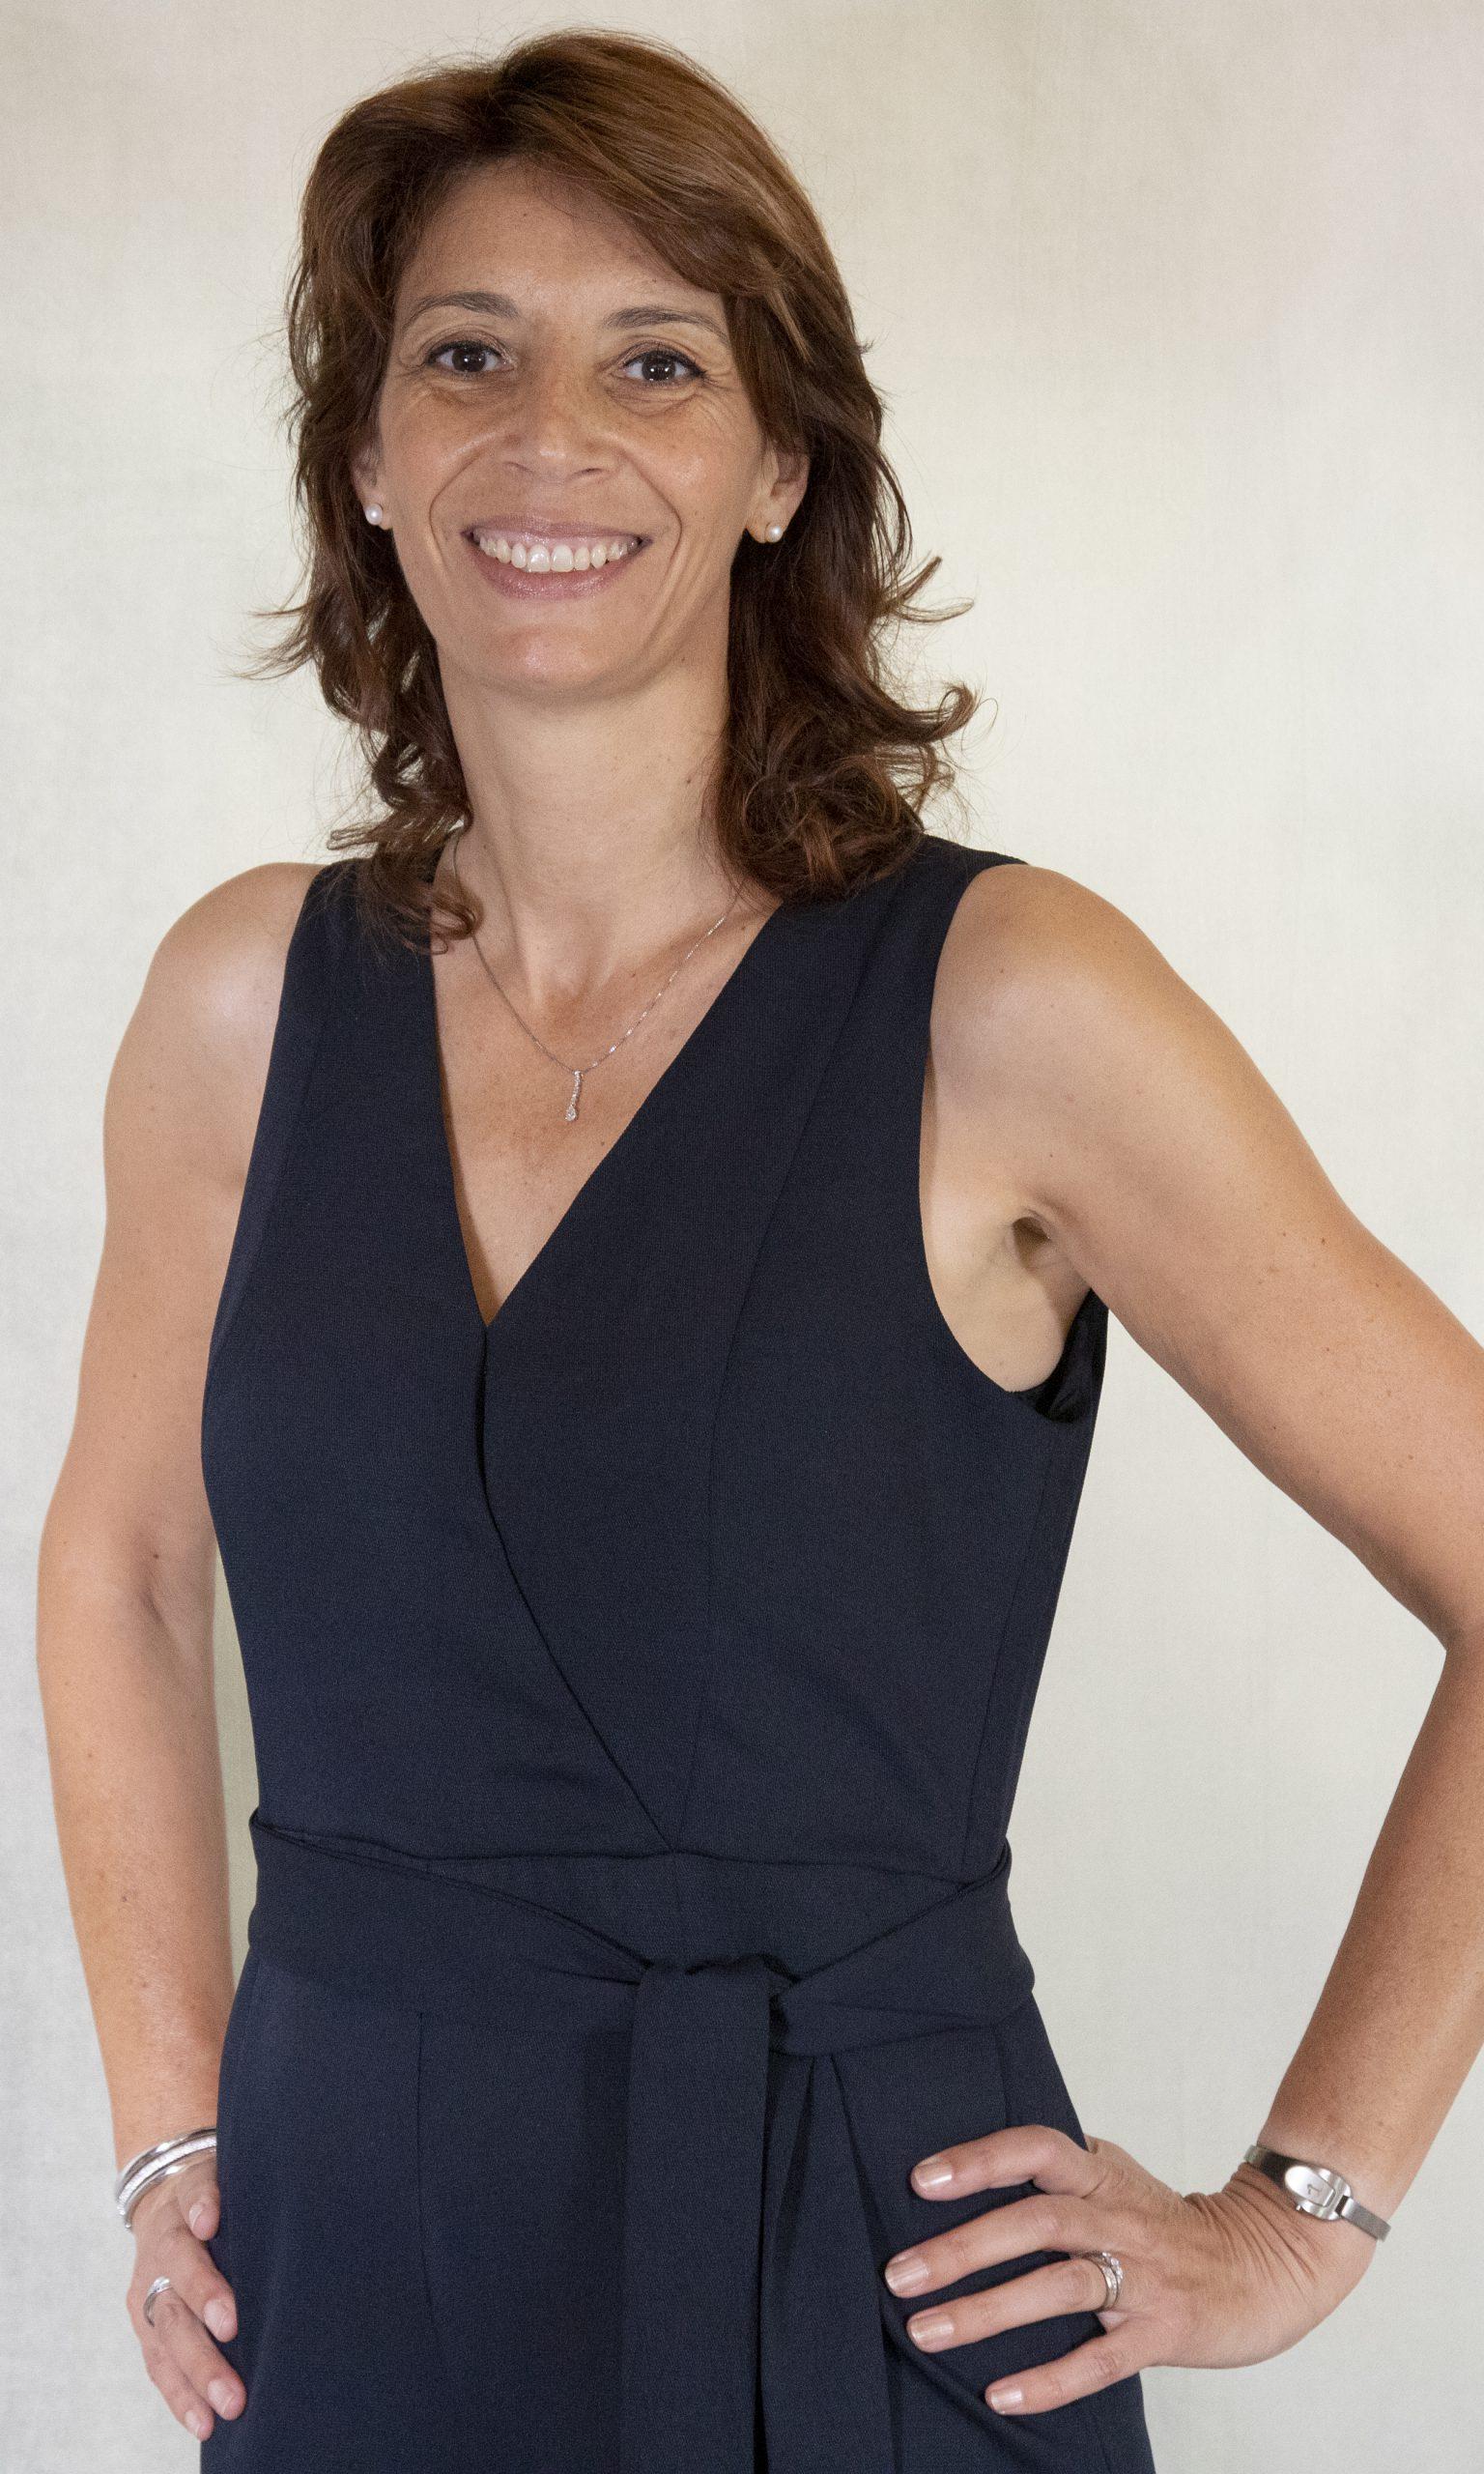 Laure Pianezza